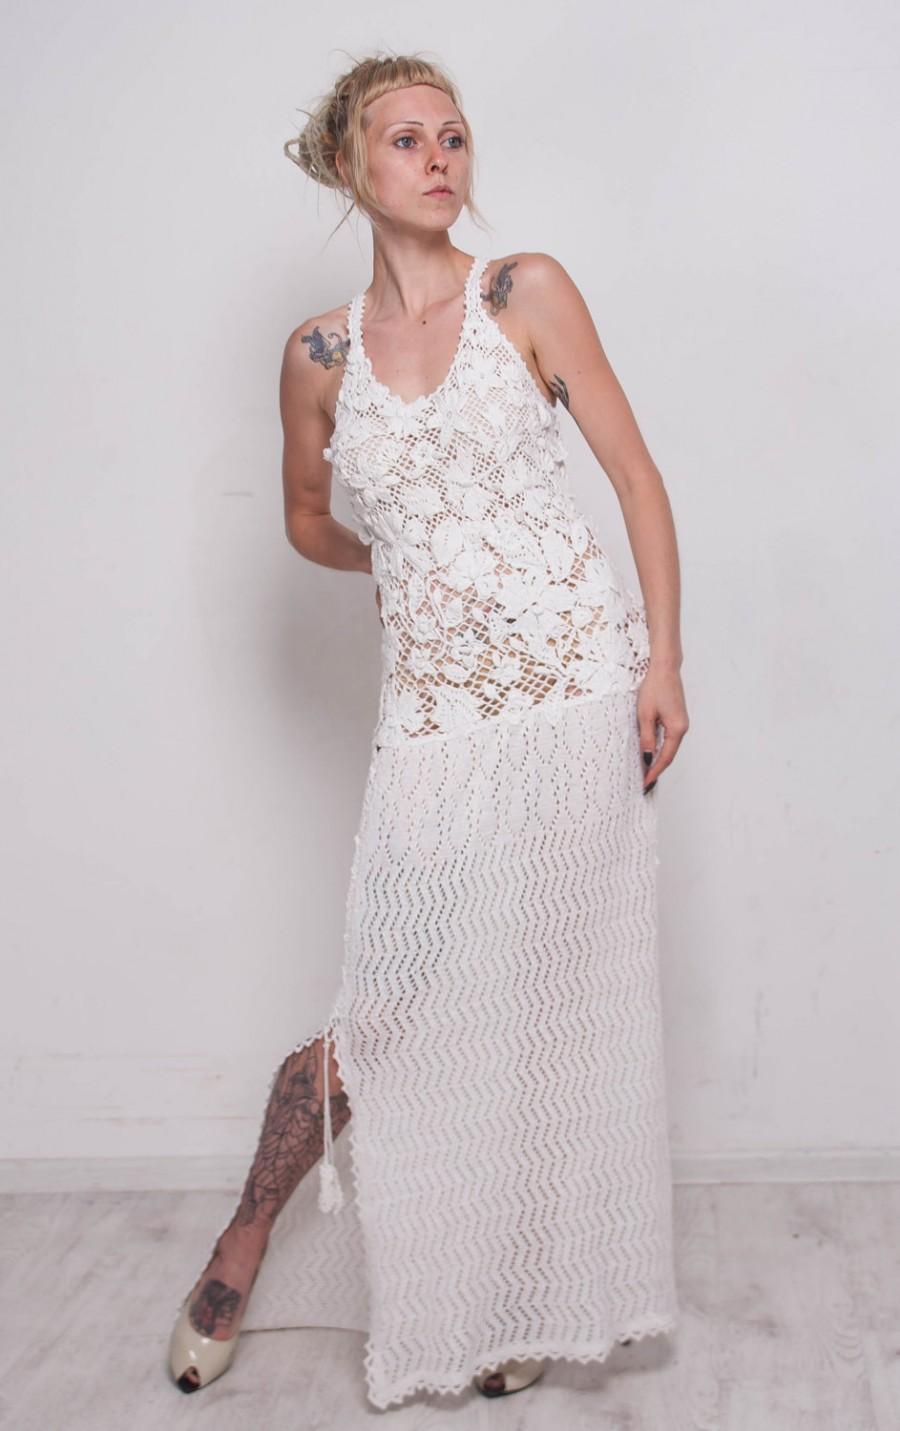 Mariage - Crochet white dress KNIT wedding Dress White Viscose Dress Maxi Dress Crochet white Dress IVORY dress Beach White SunDress Bridal Maxi Dress